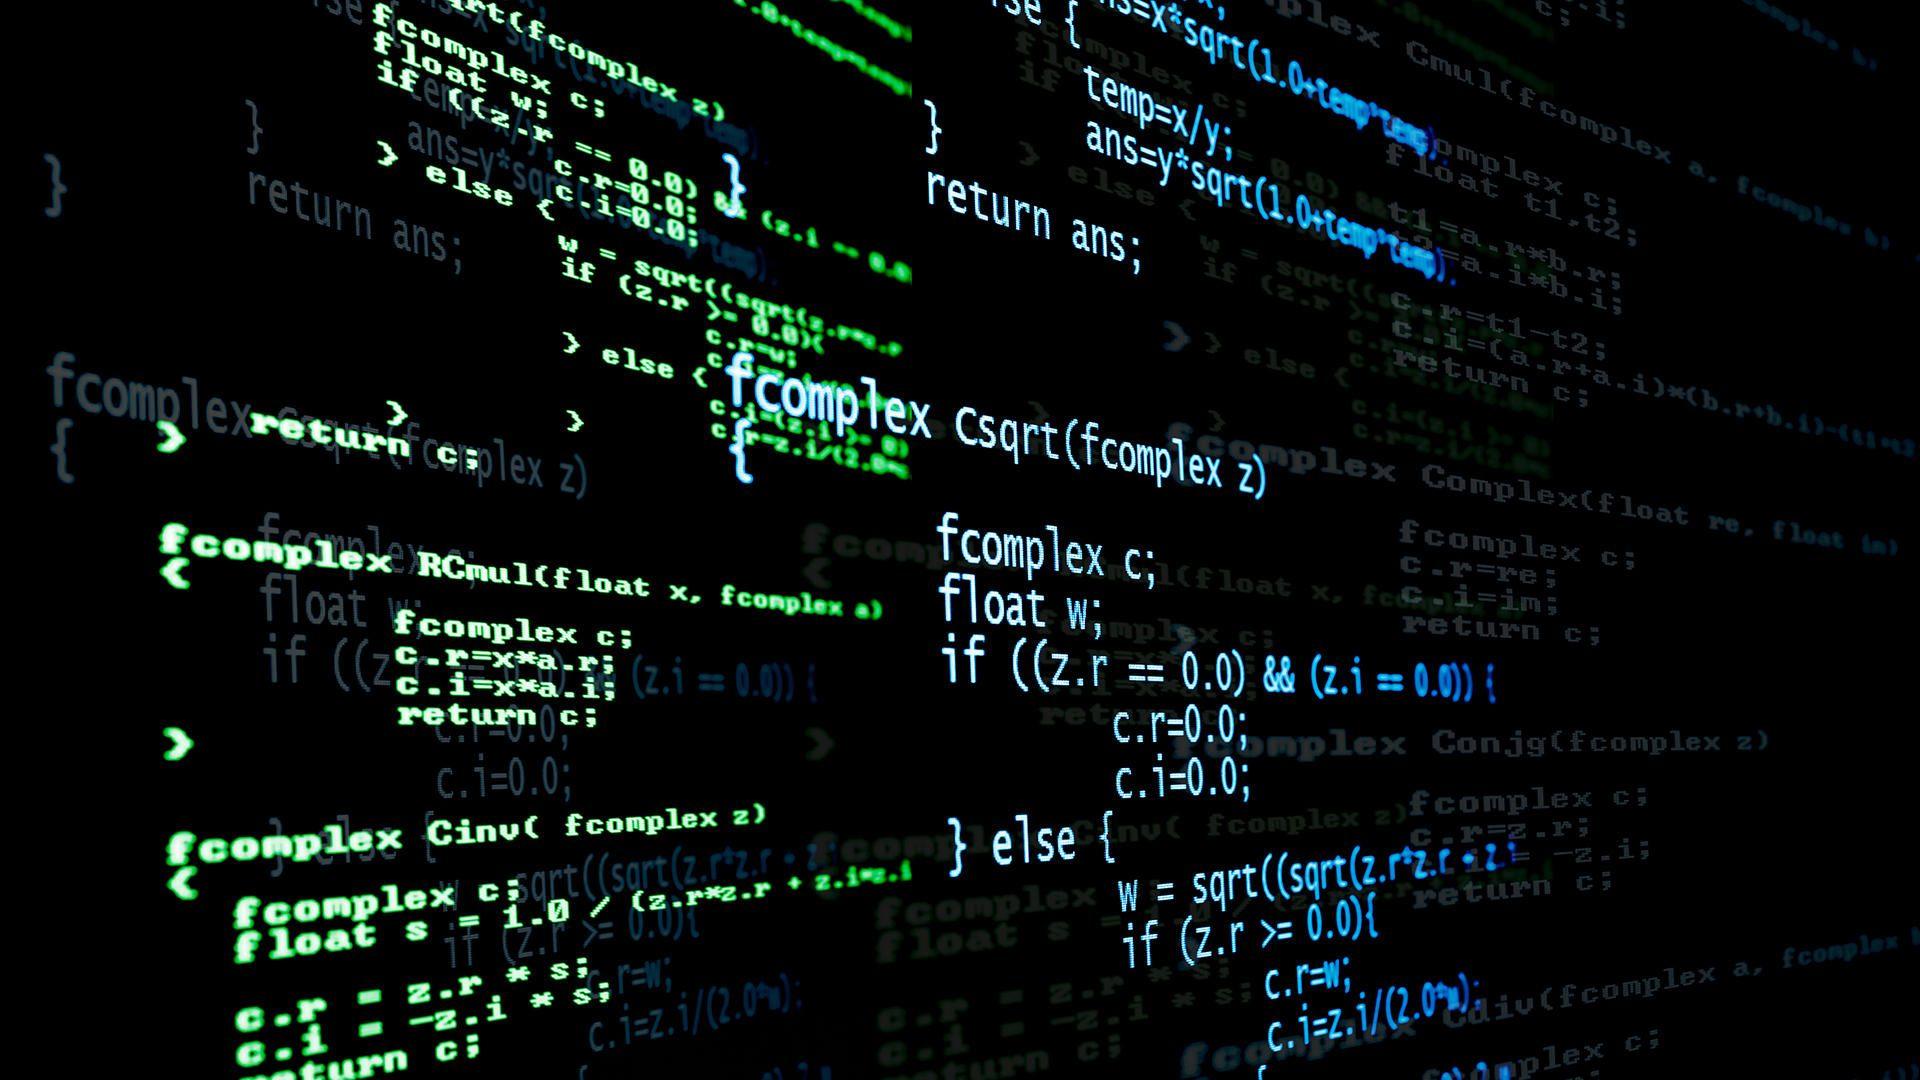 code.jpg.44c1e7ade57fd28f1bf1c07619f6b5b1.jpg